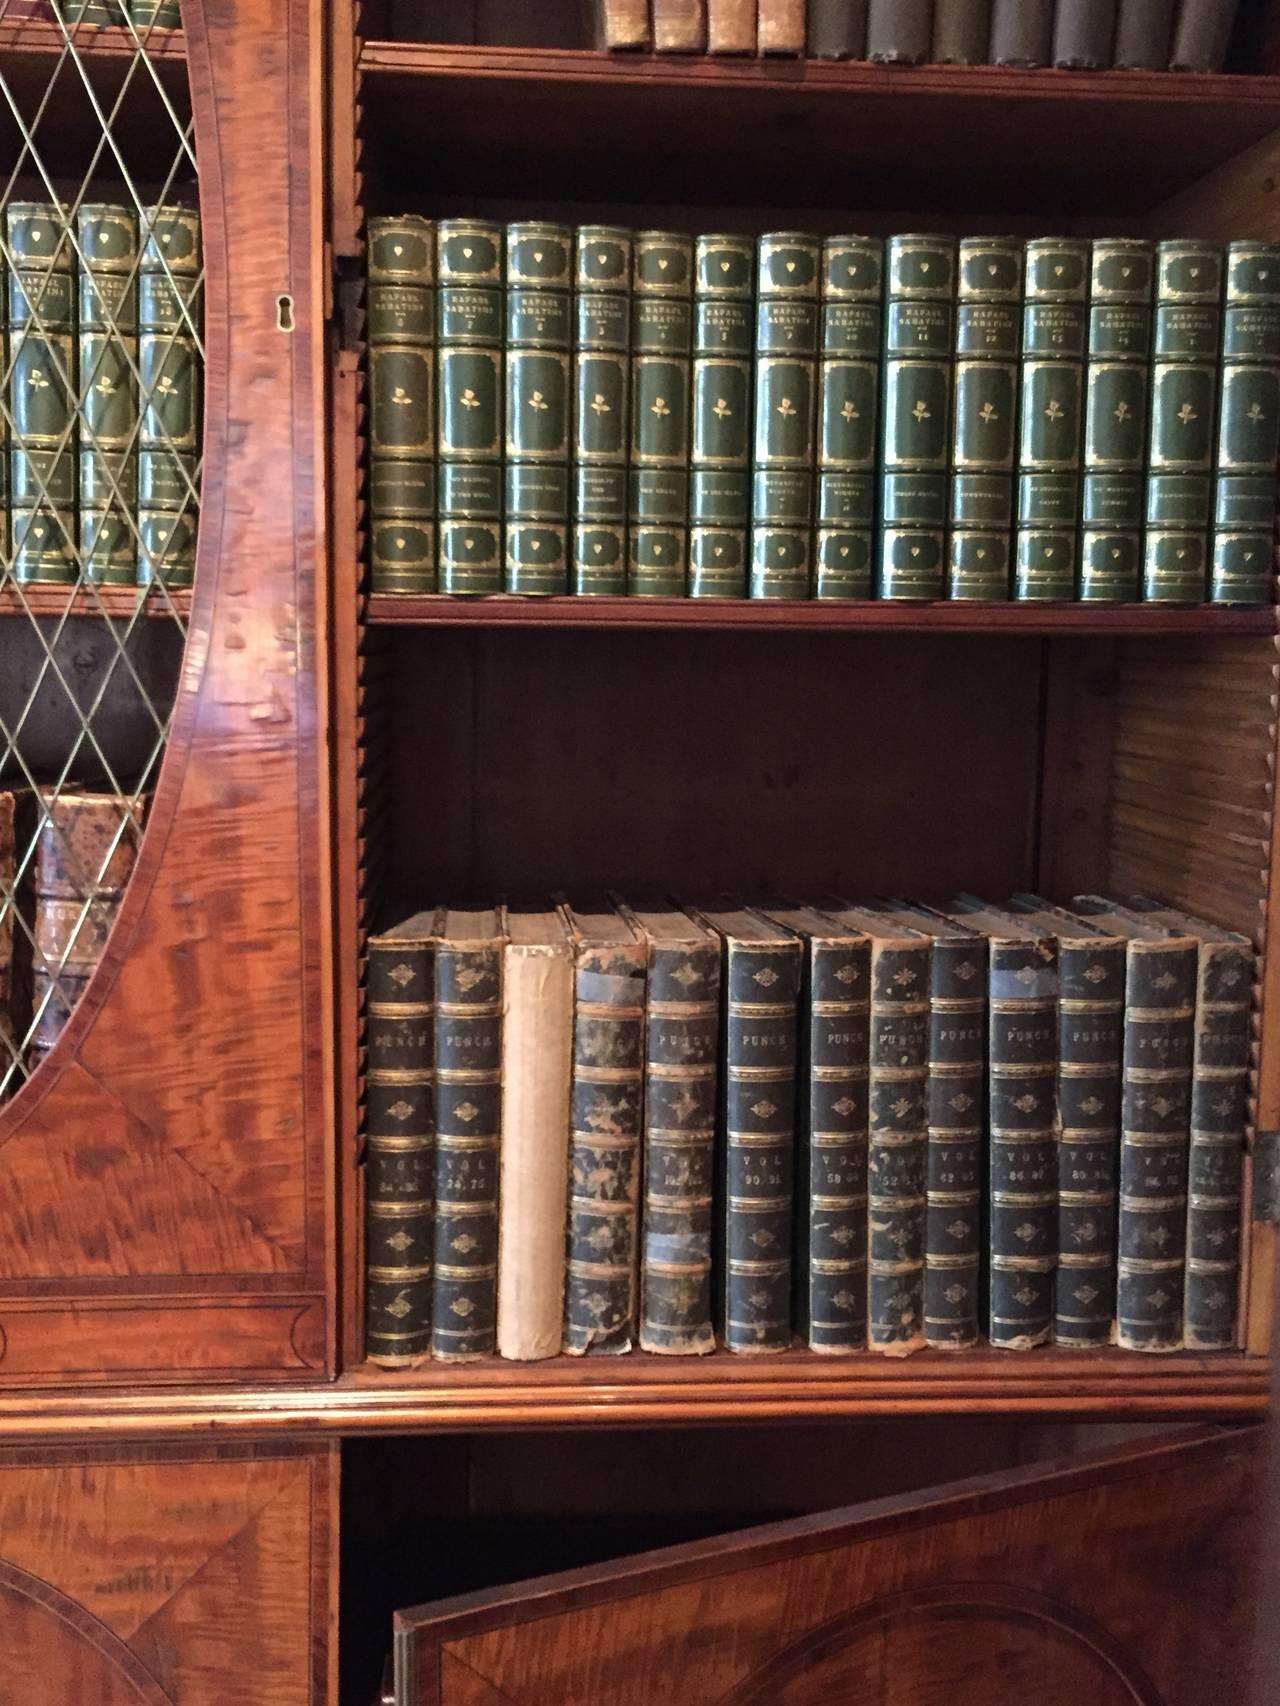 Inlay Fine Hepplewhite Decorated Inlaid Satinwood & Mahogany Two-Part Bookcase Cabinet